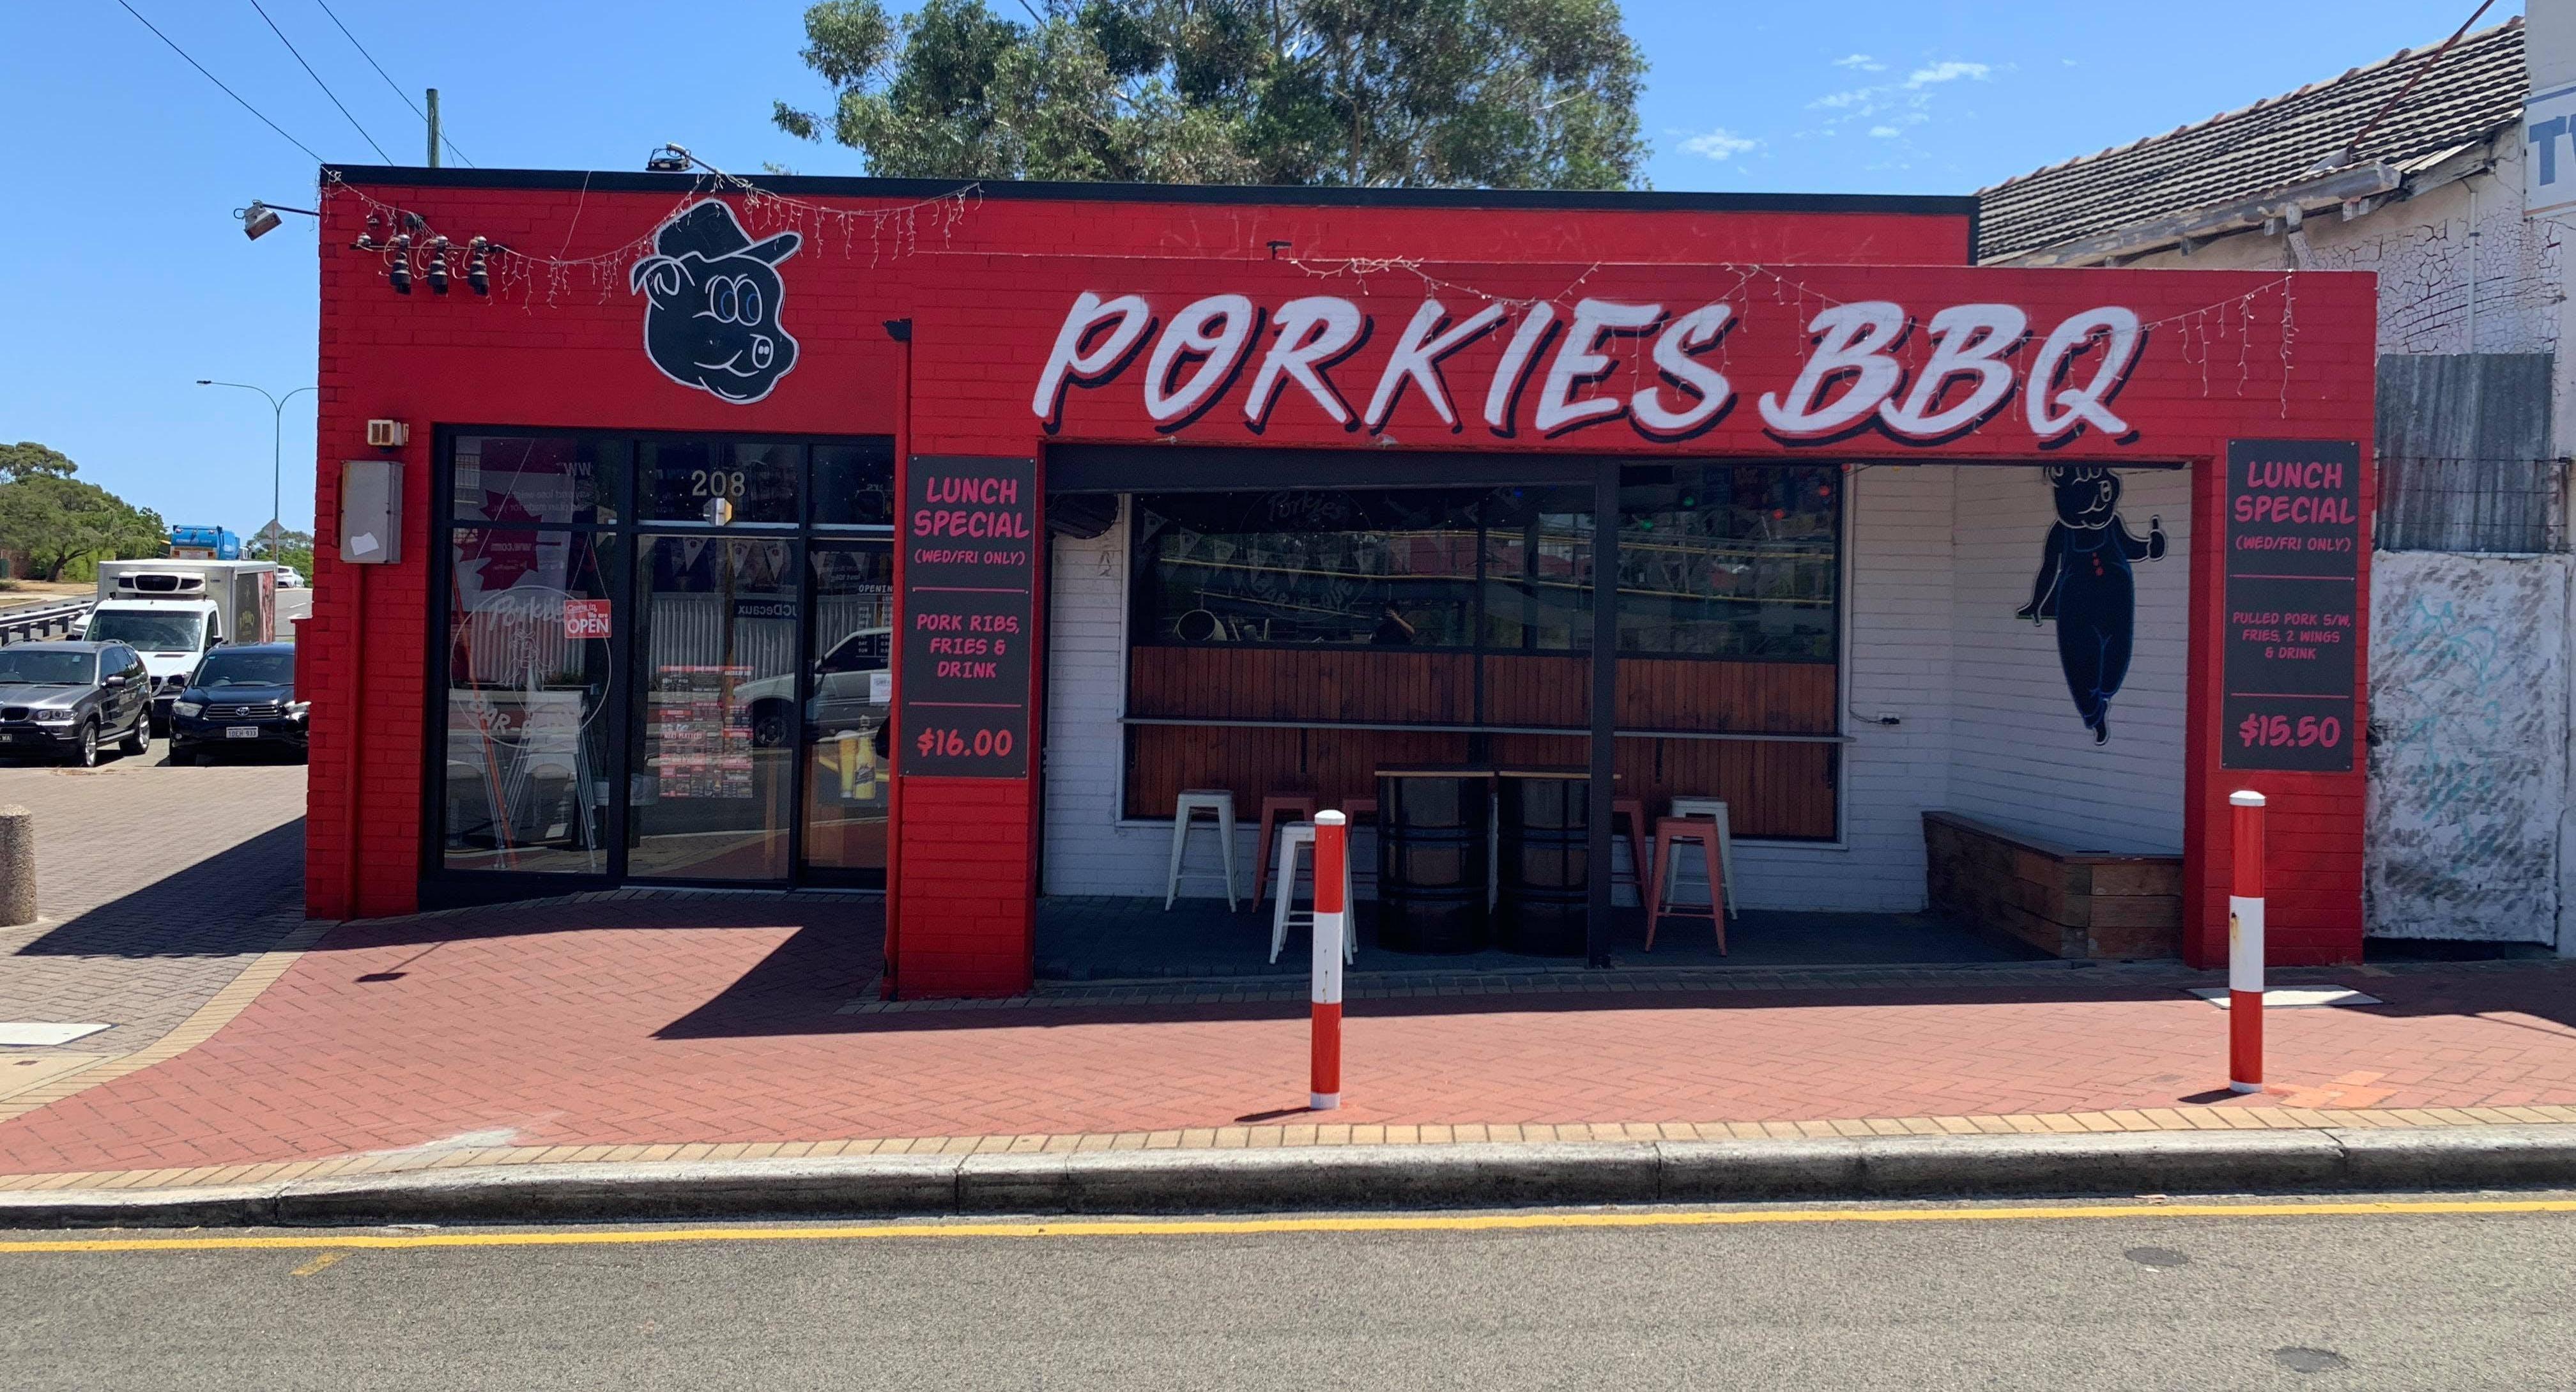 Photo of restaurant Porkies BAR-B-QUE in Bayswater, Perth